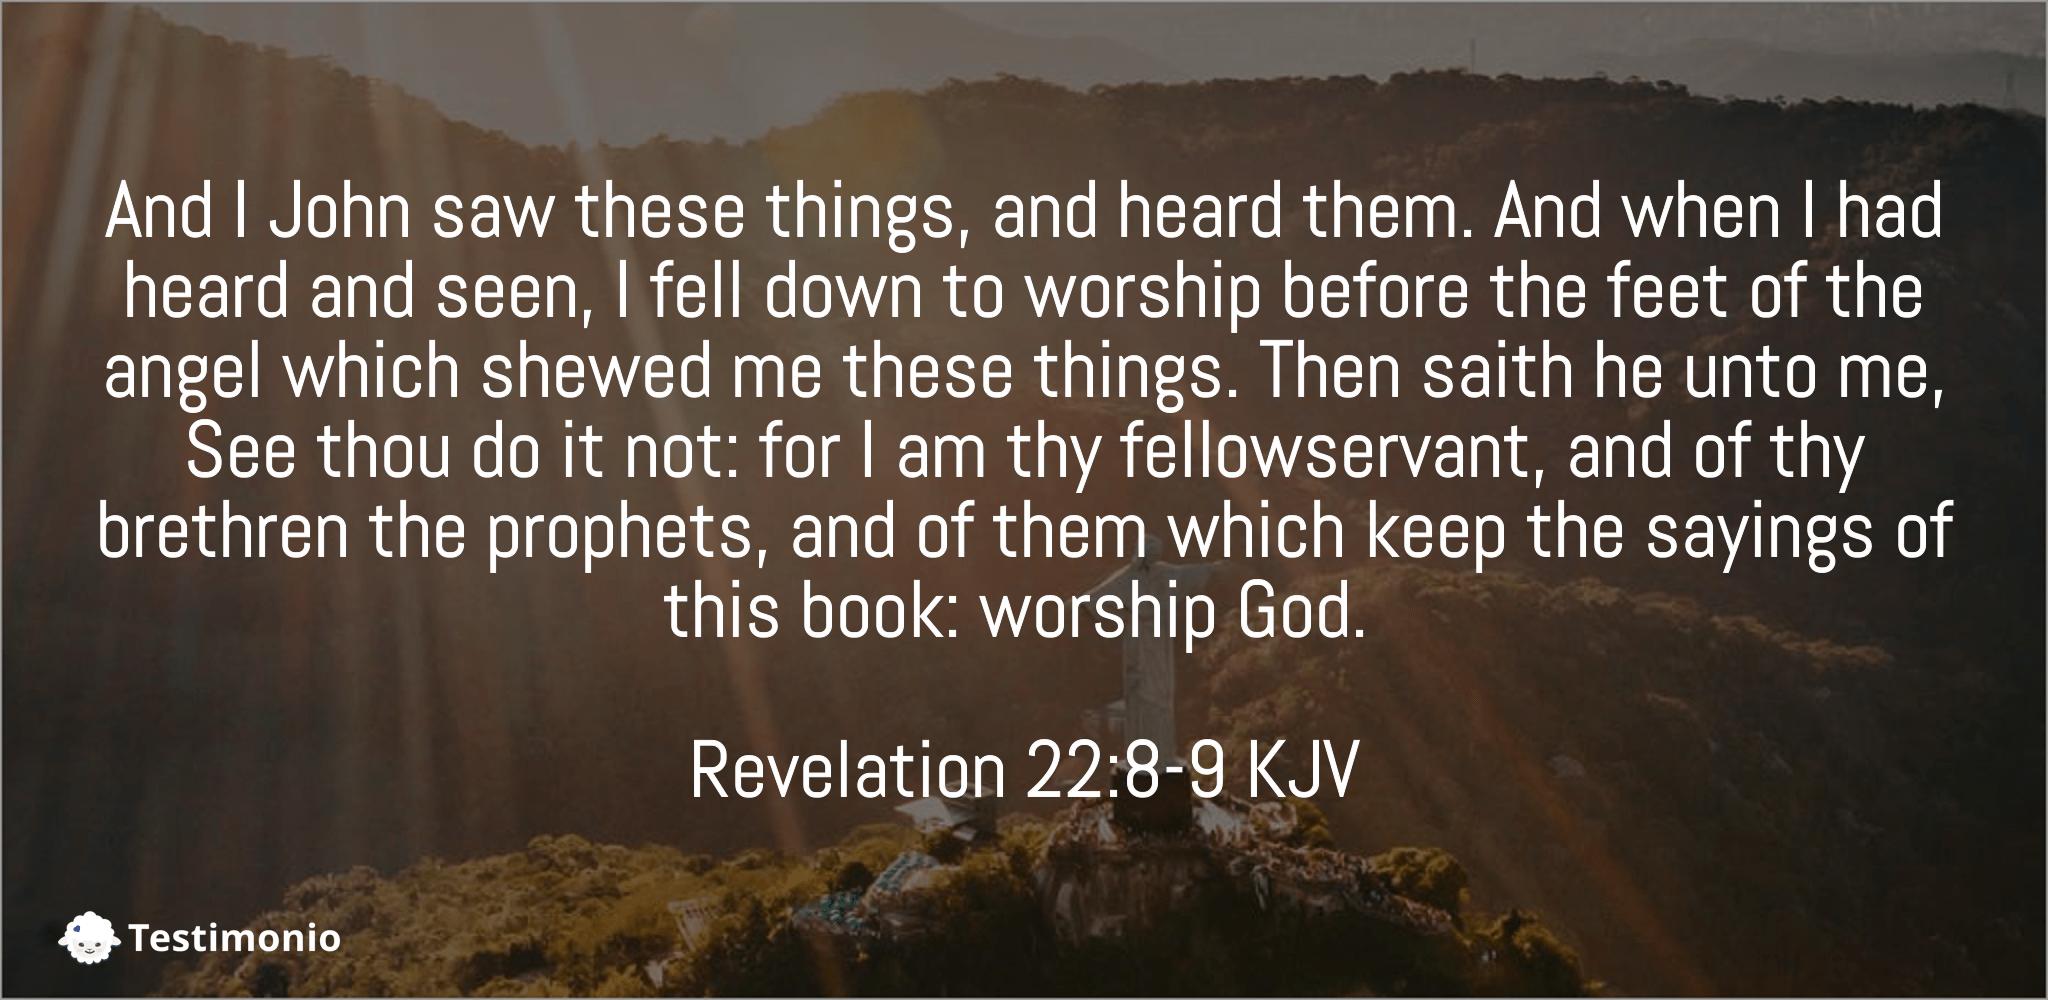 Revelation 22:8-9